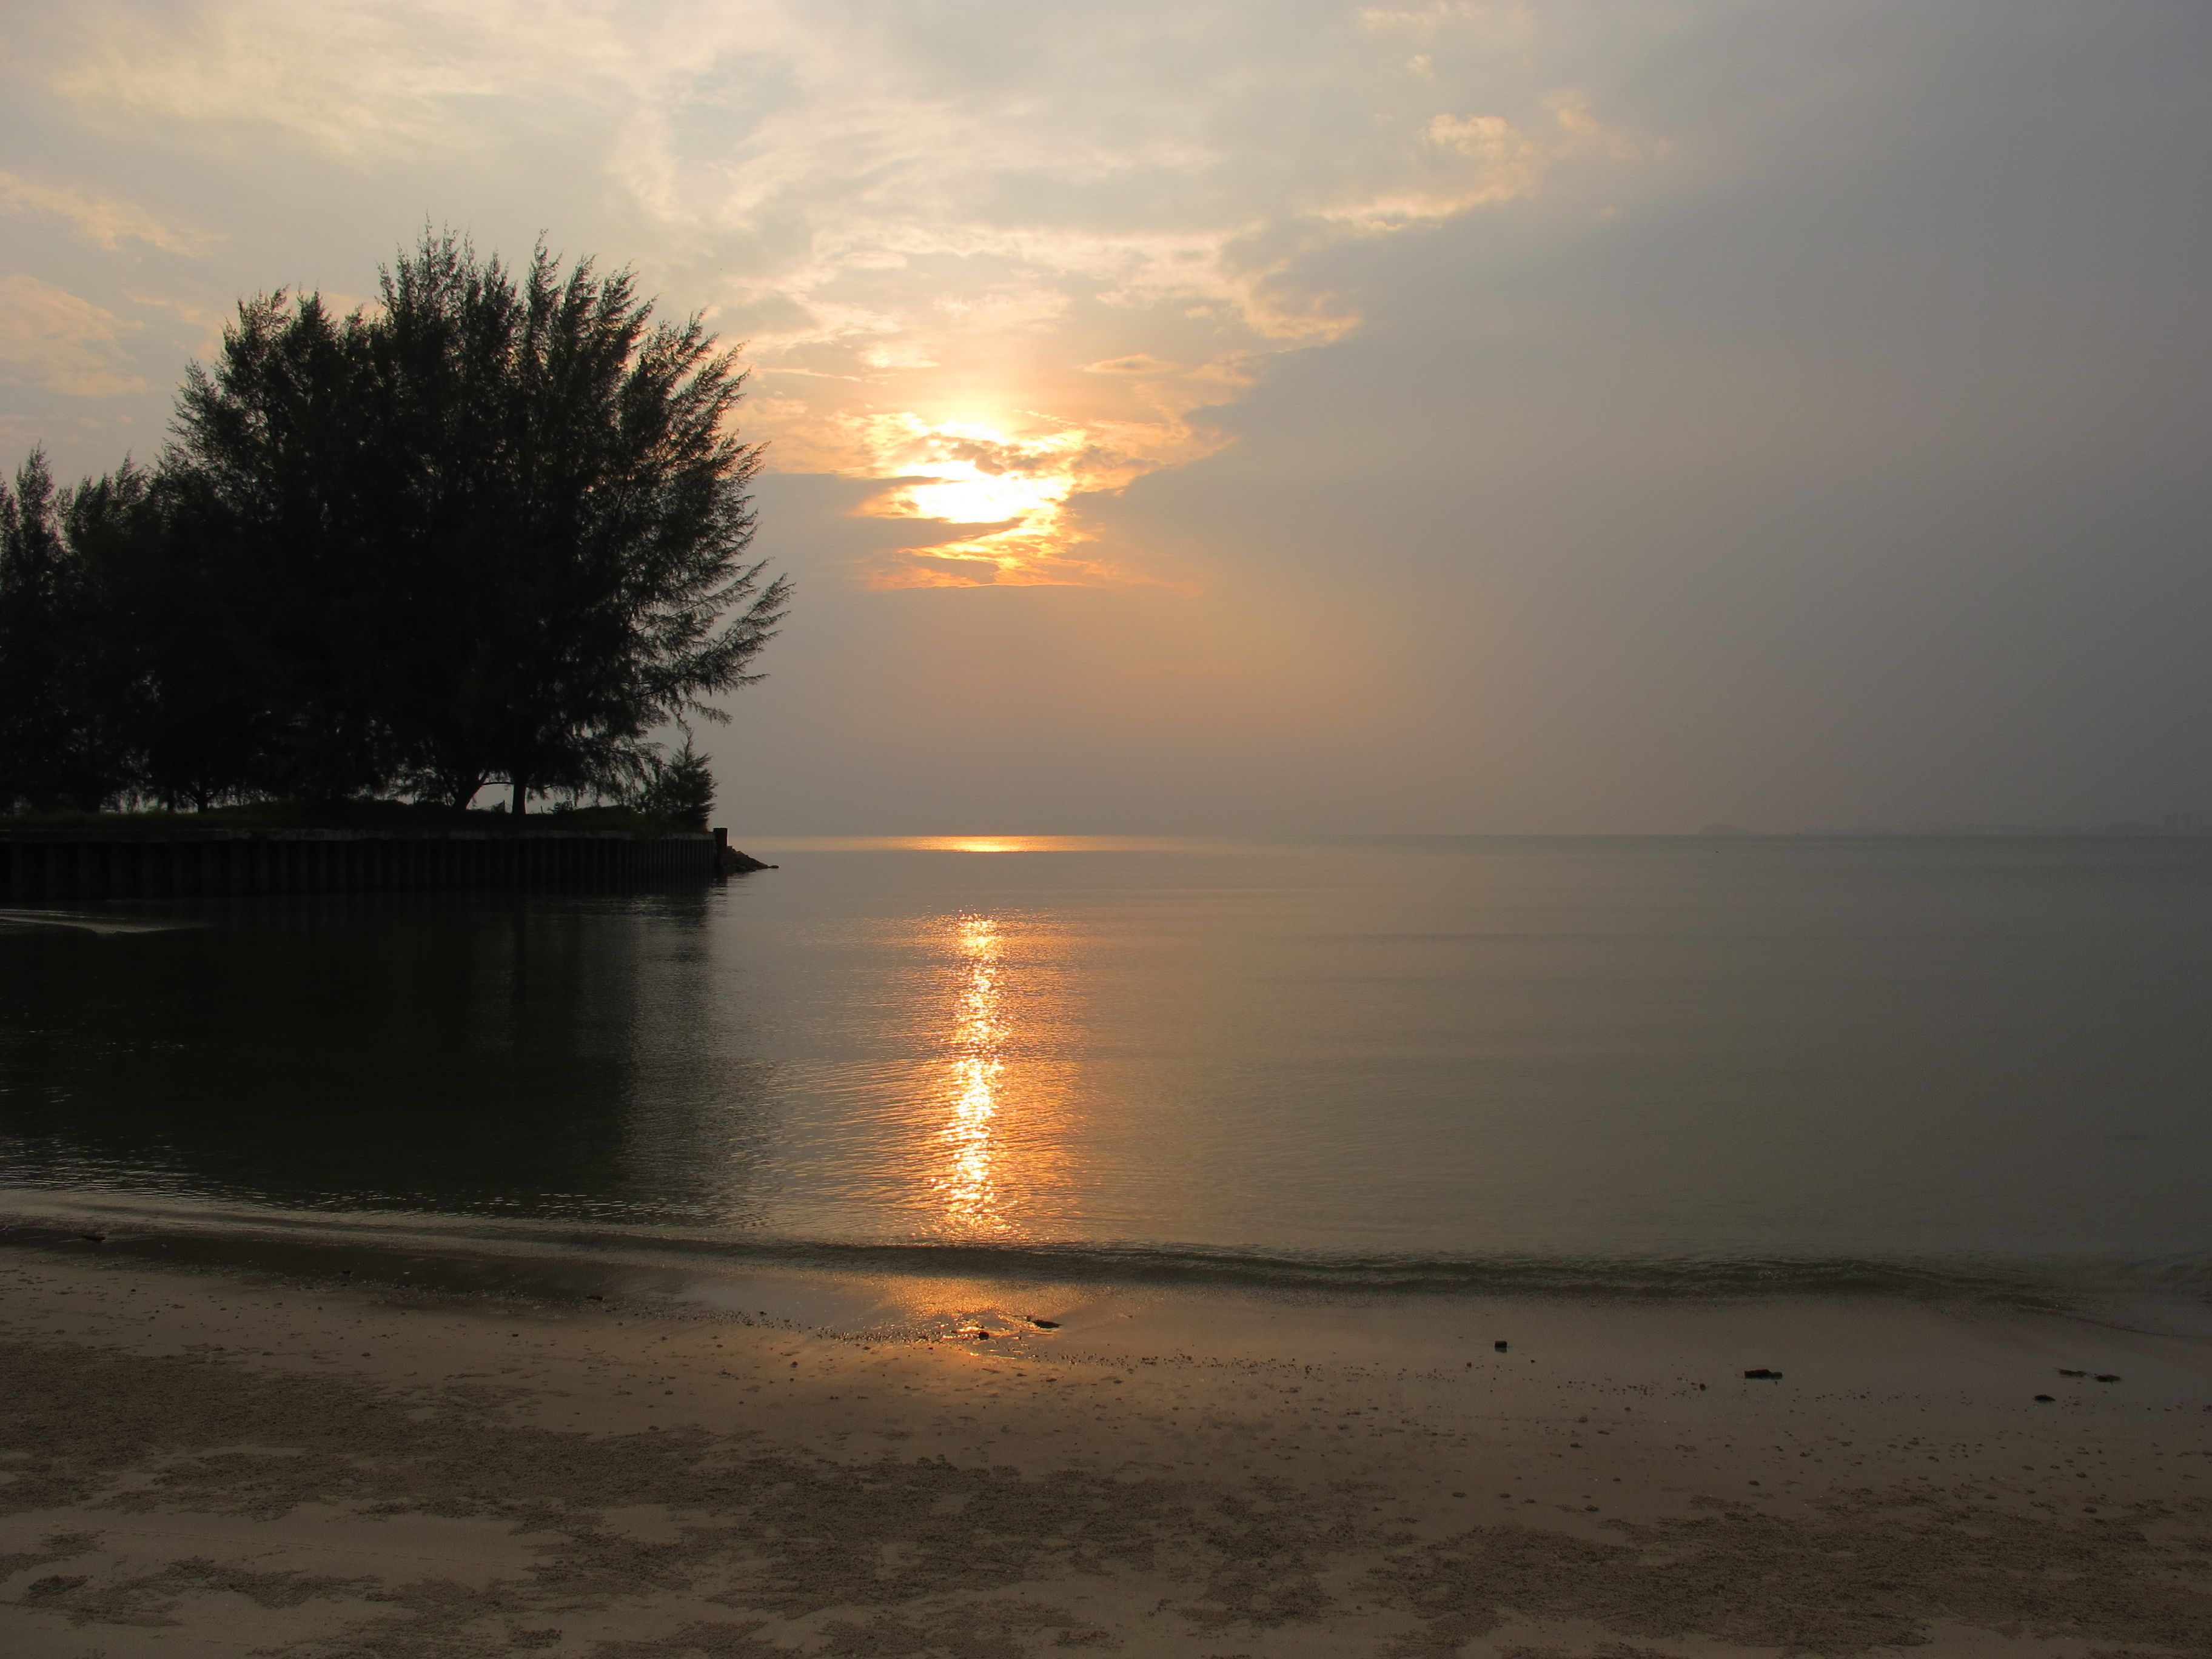 Port Dickson, Malaysia... beautiful sunset